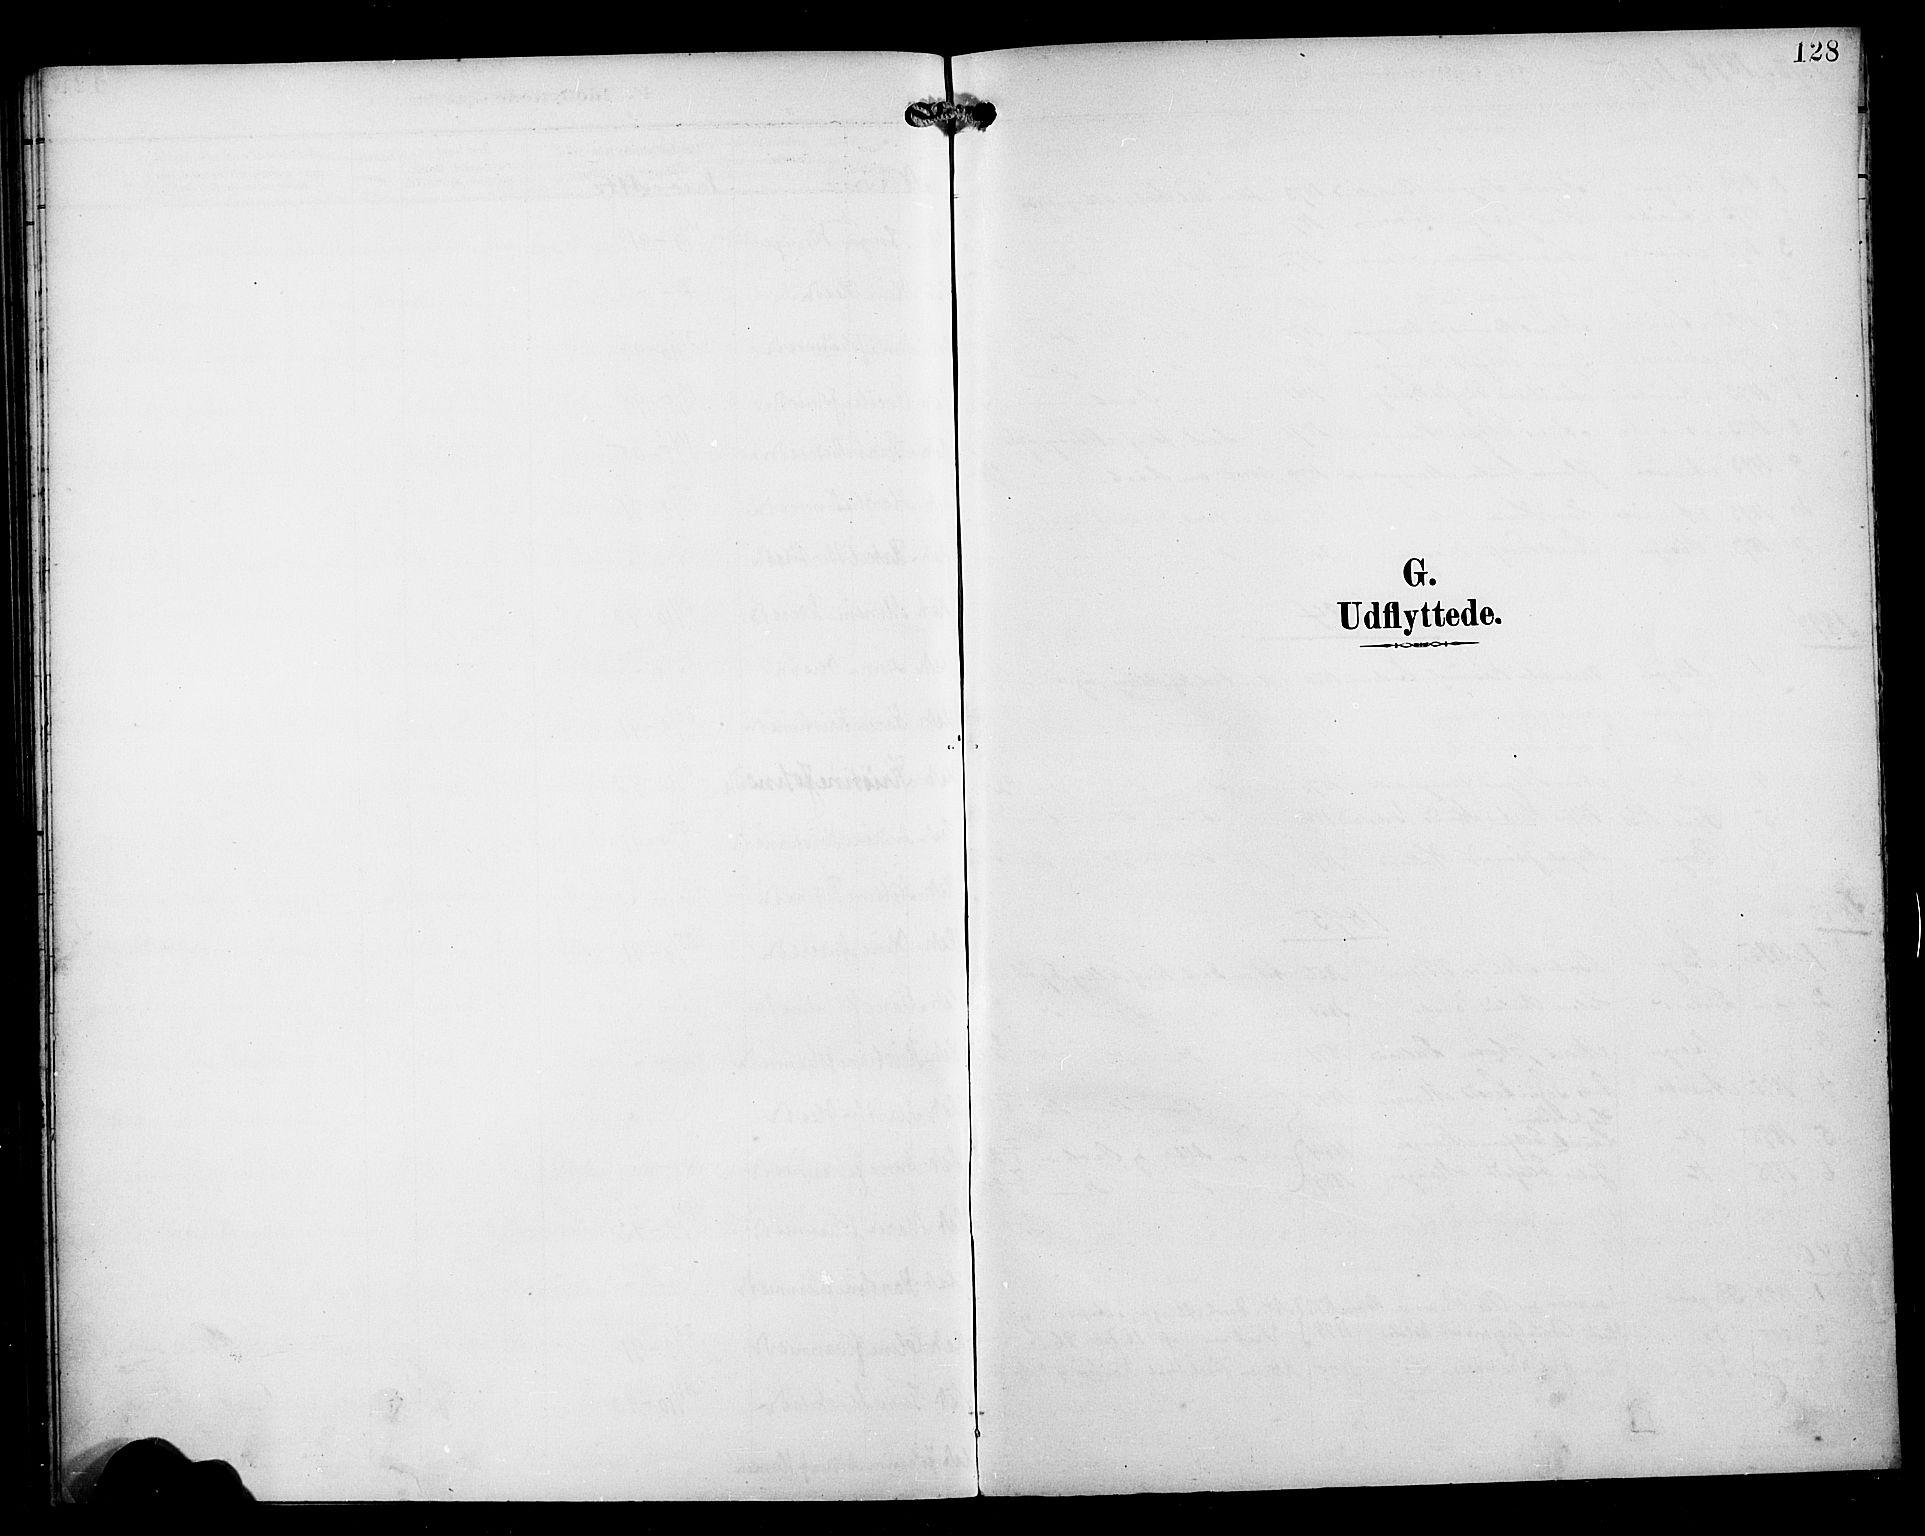 SAB, Manger sokneprestembete, H/Haa: Ministerialbok nr. B 2, 1893-1906, s. 128